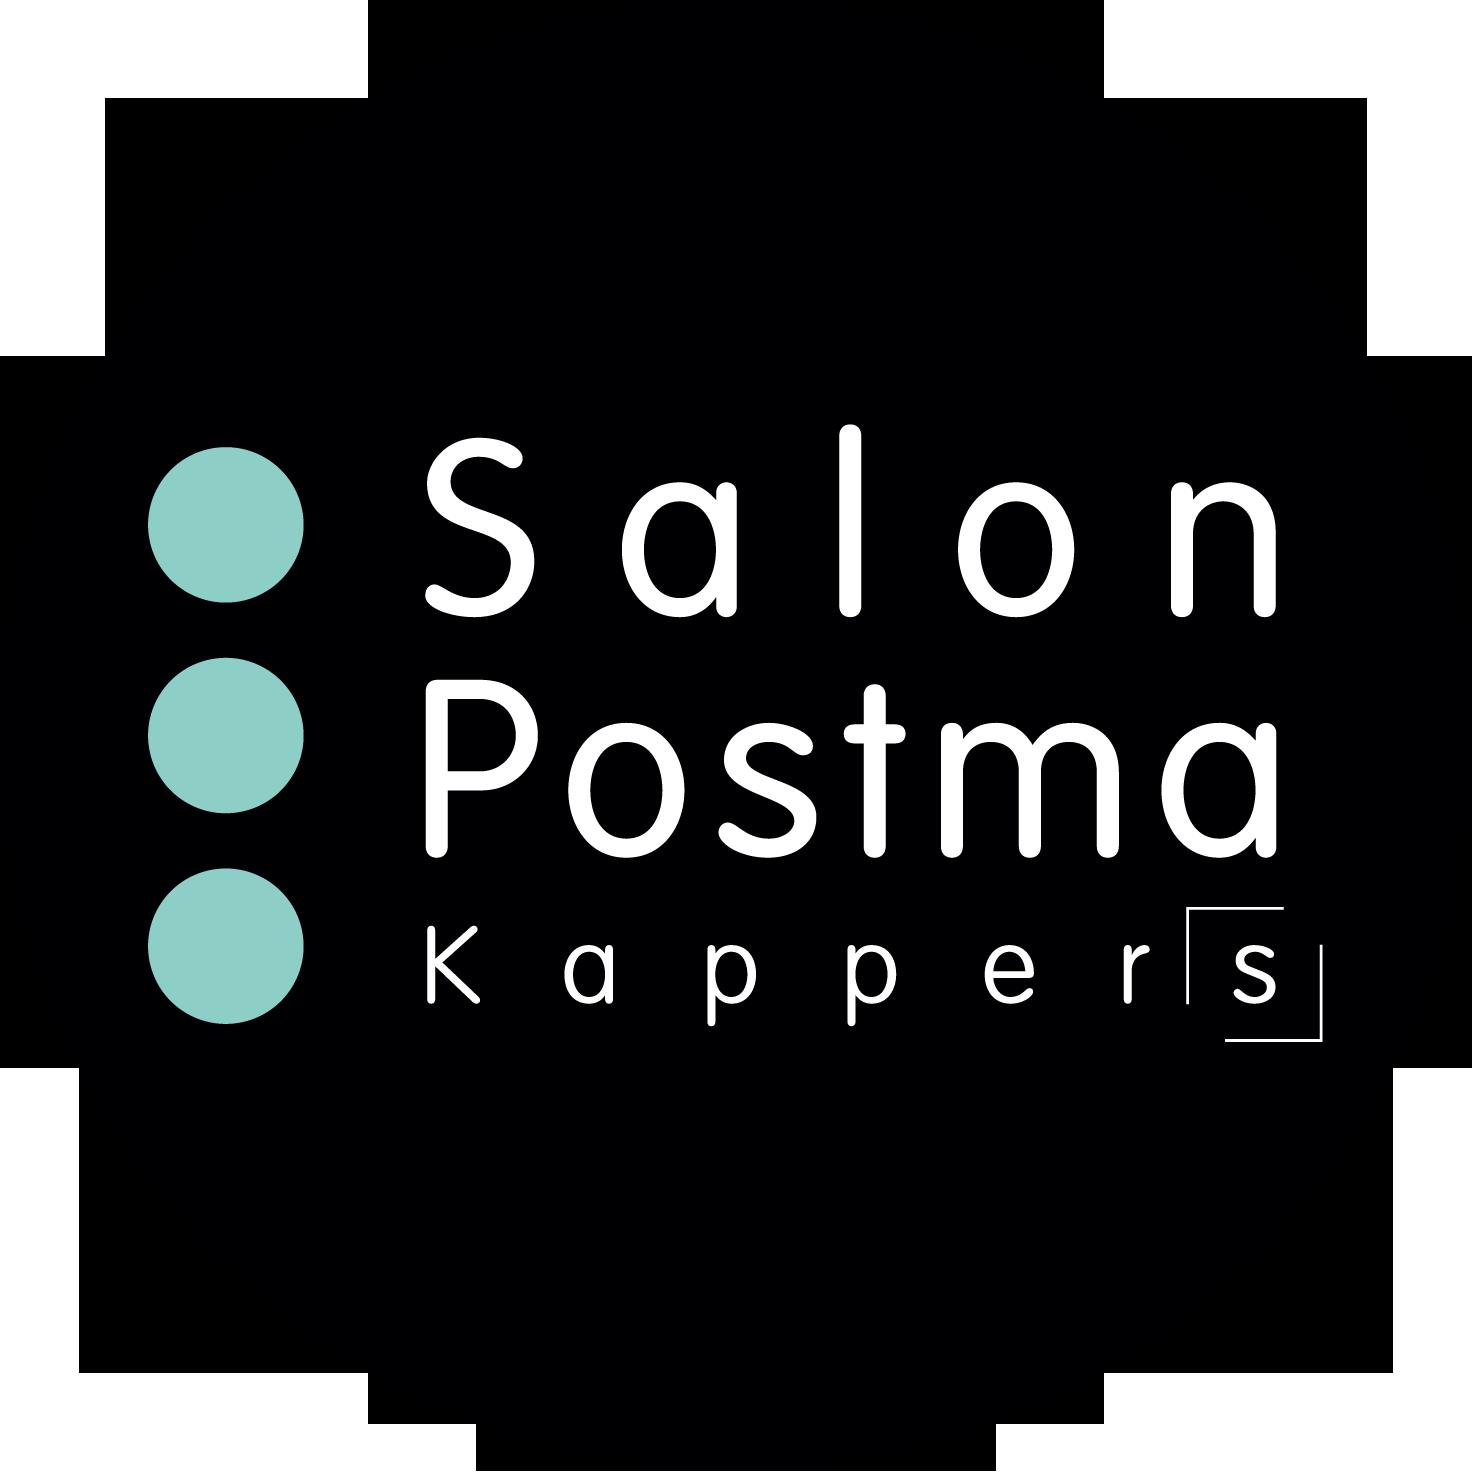 Kapper Leeuwarden - Kapsalon Salon Postma Kappers